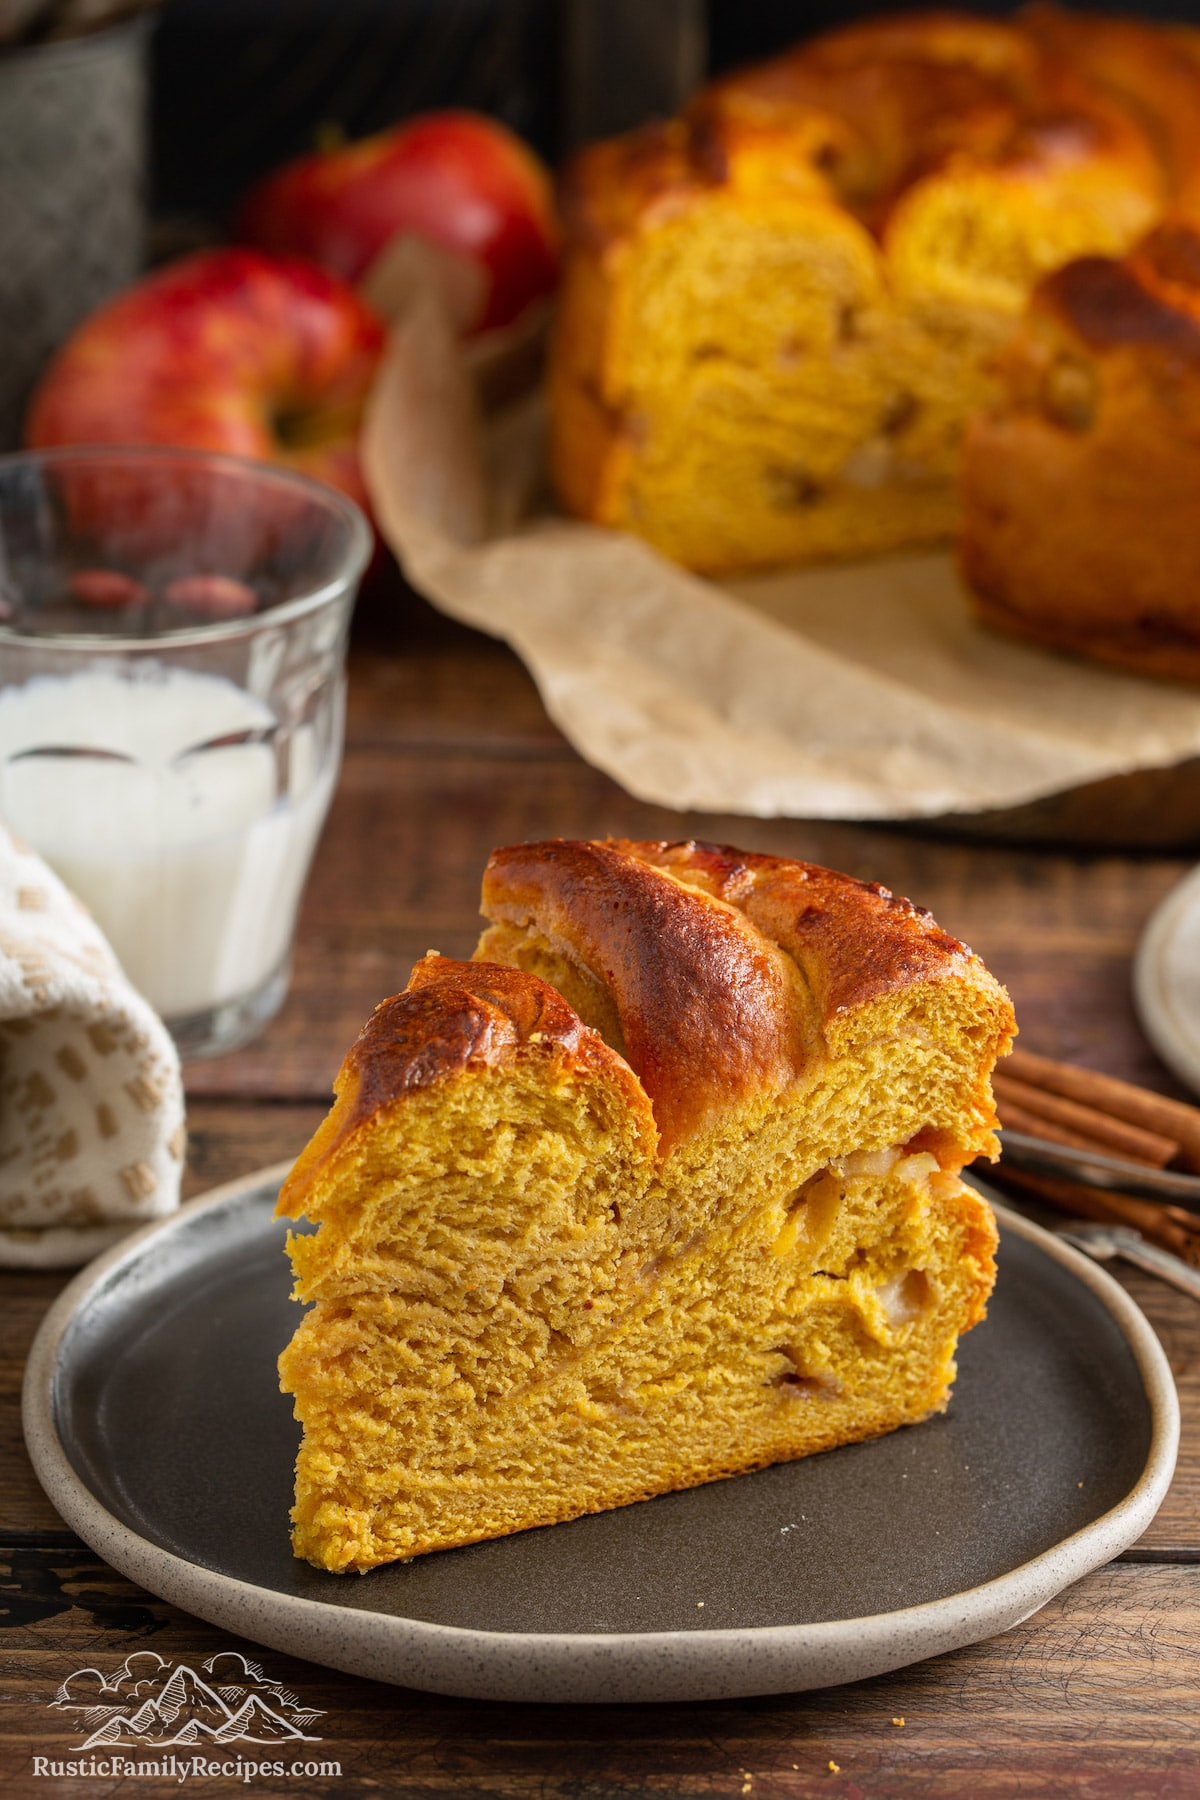 Slice of Pumpkin Apple Apricot Bread on rustic gray plate